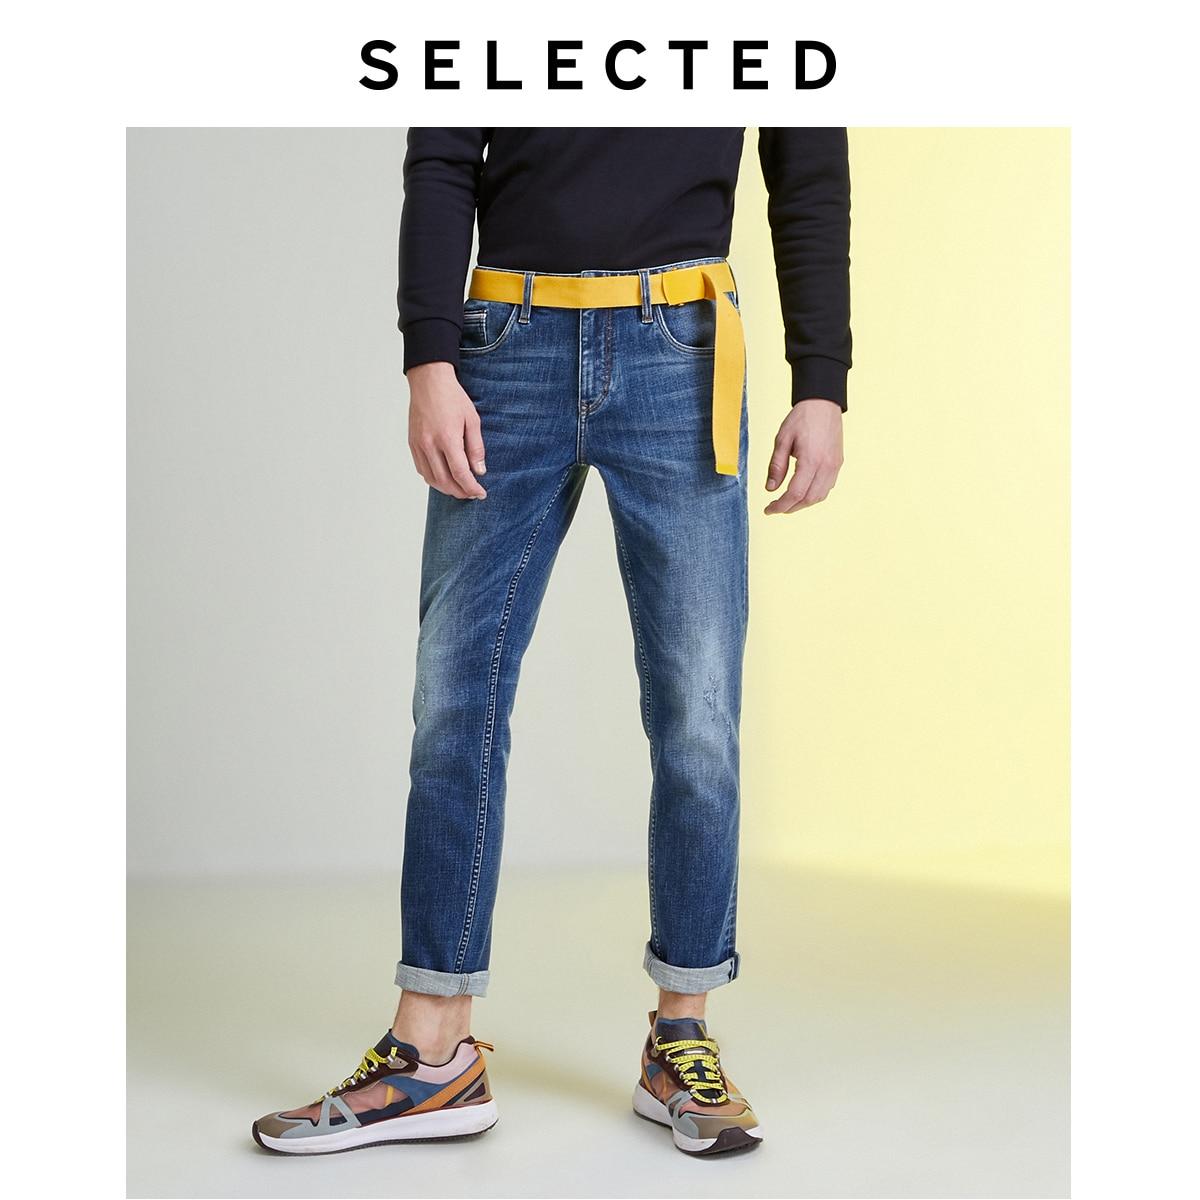 SELECTED Men's Slim Fit Stretch Cotton Jeans LAB|419432526